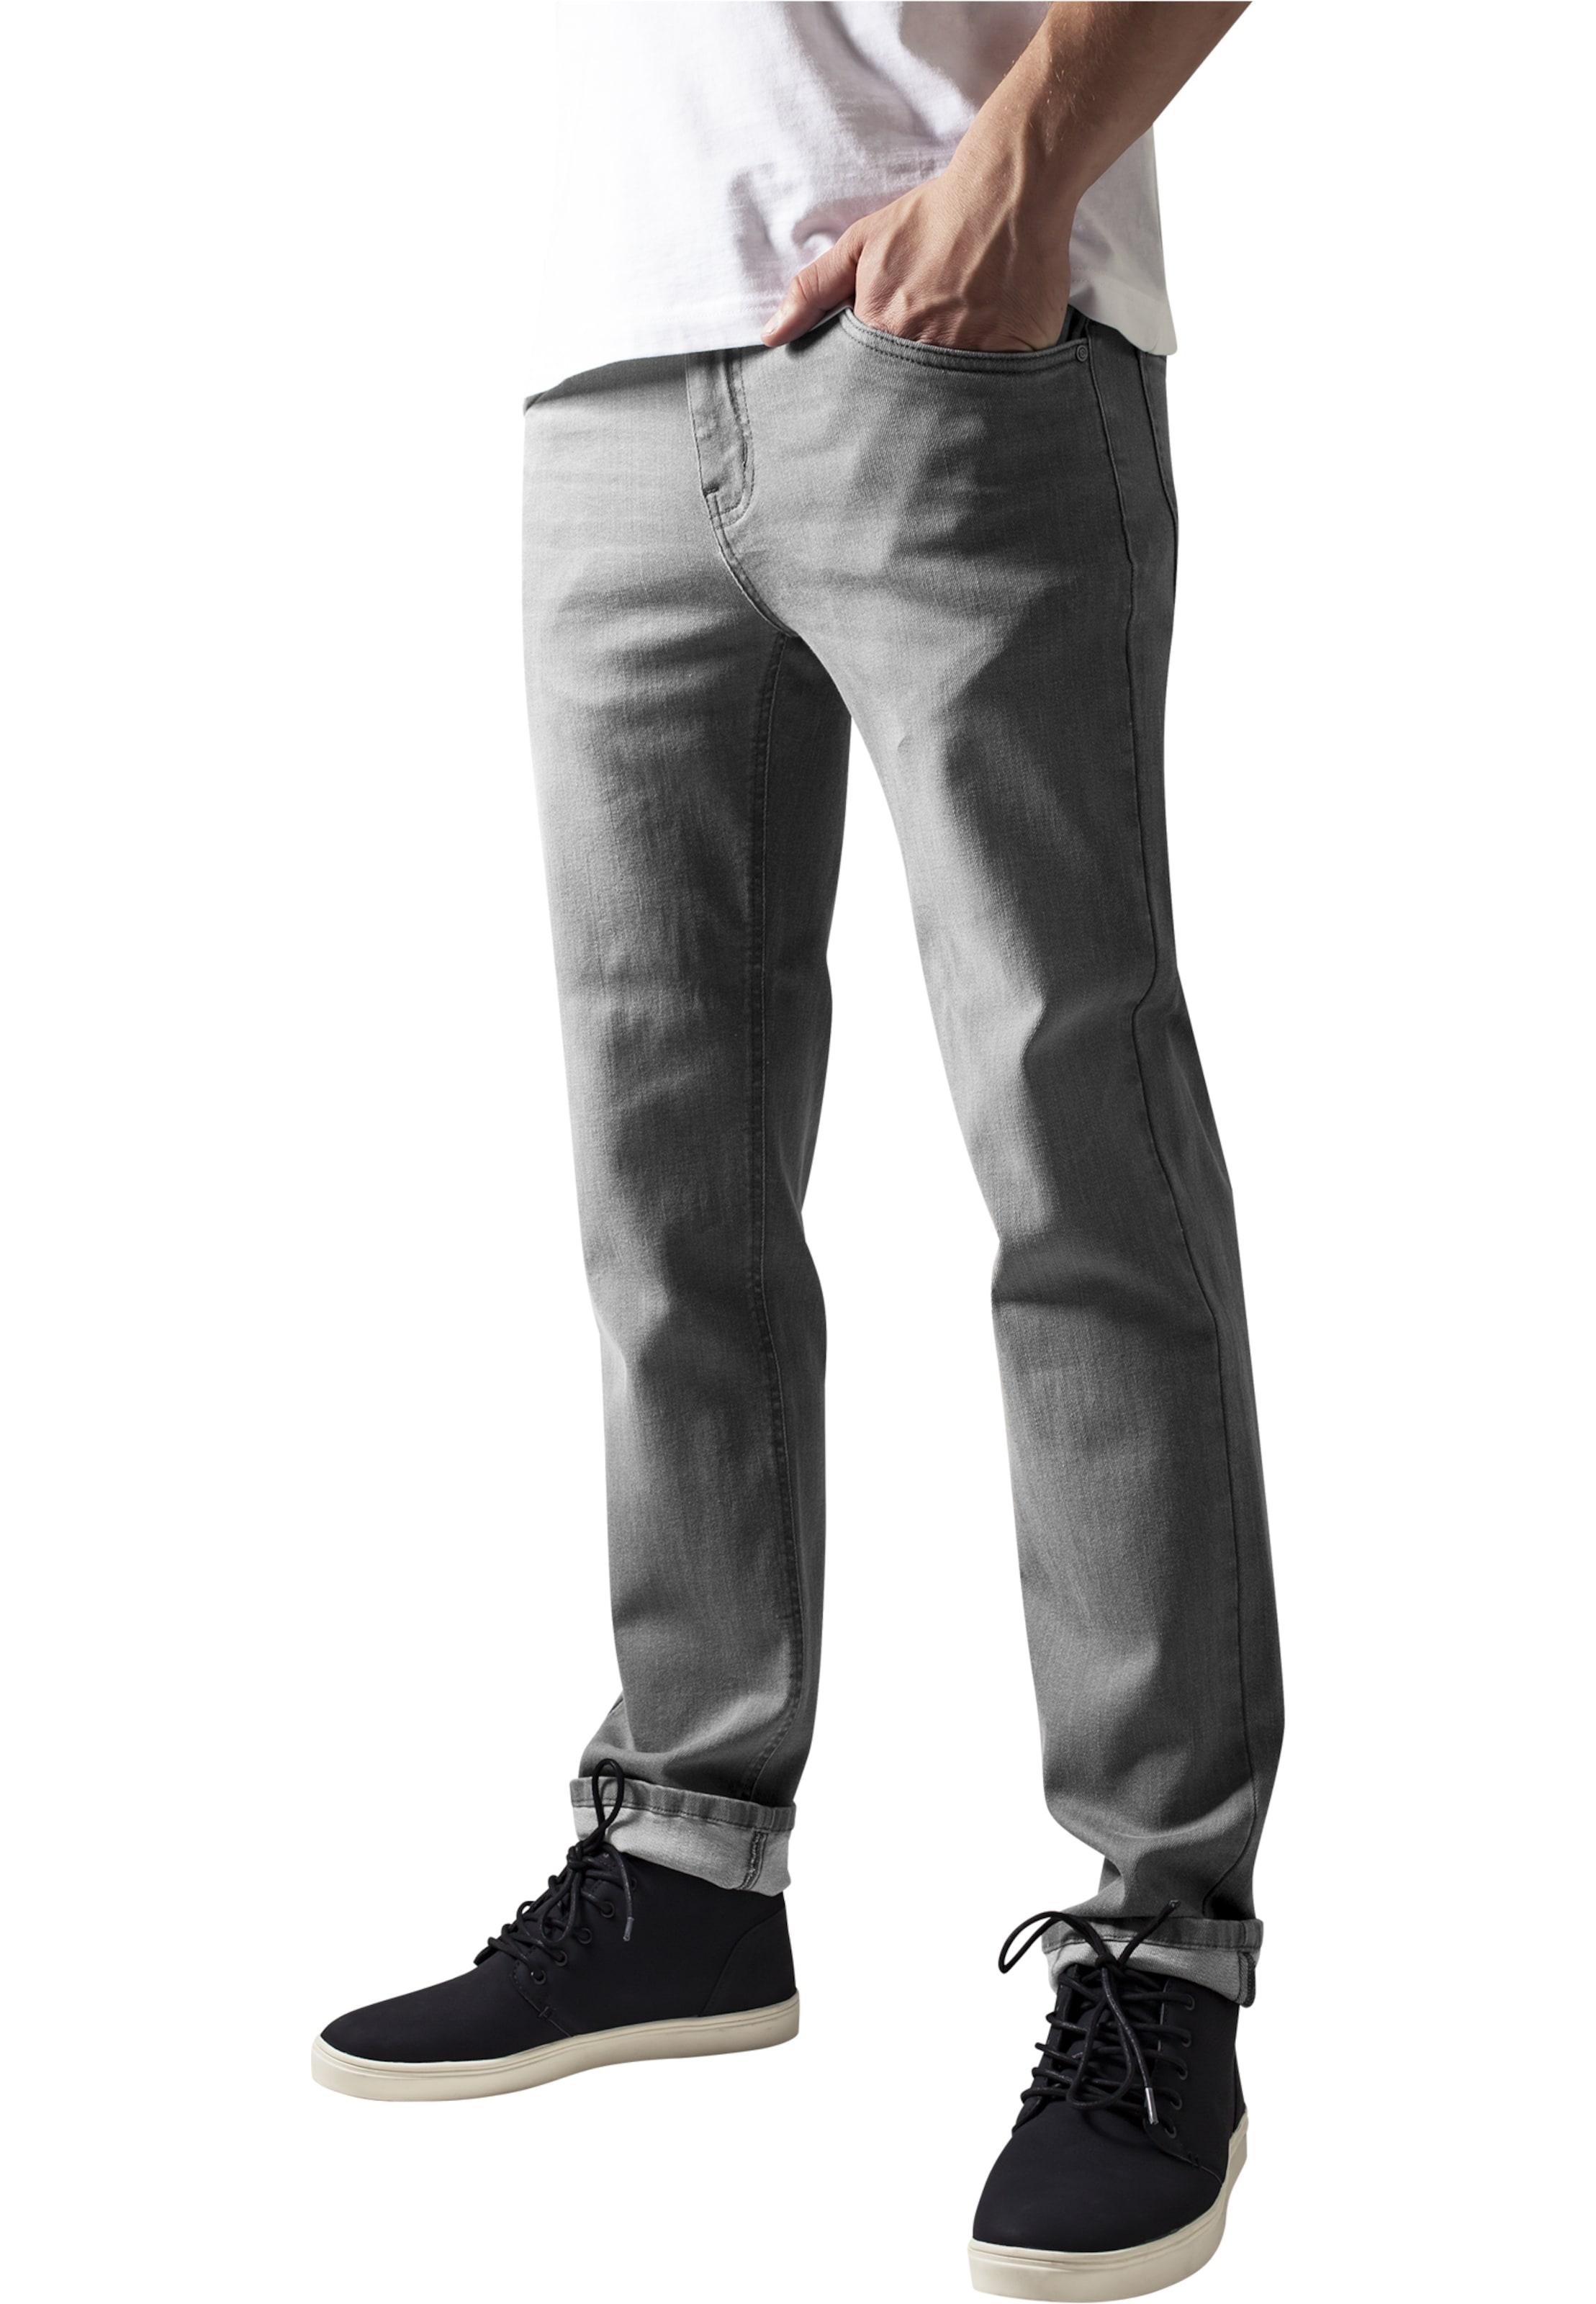 Stretch Pants In Denim Grey Classics Urban mvnN0O8w